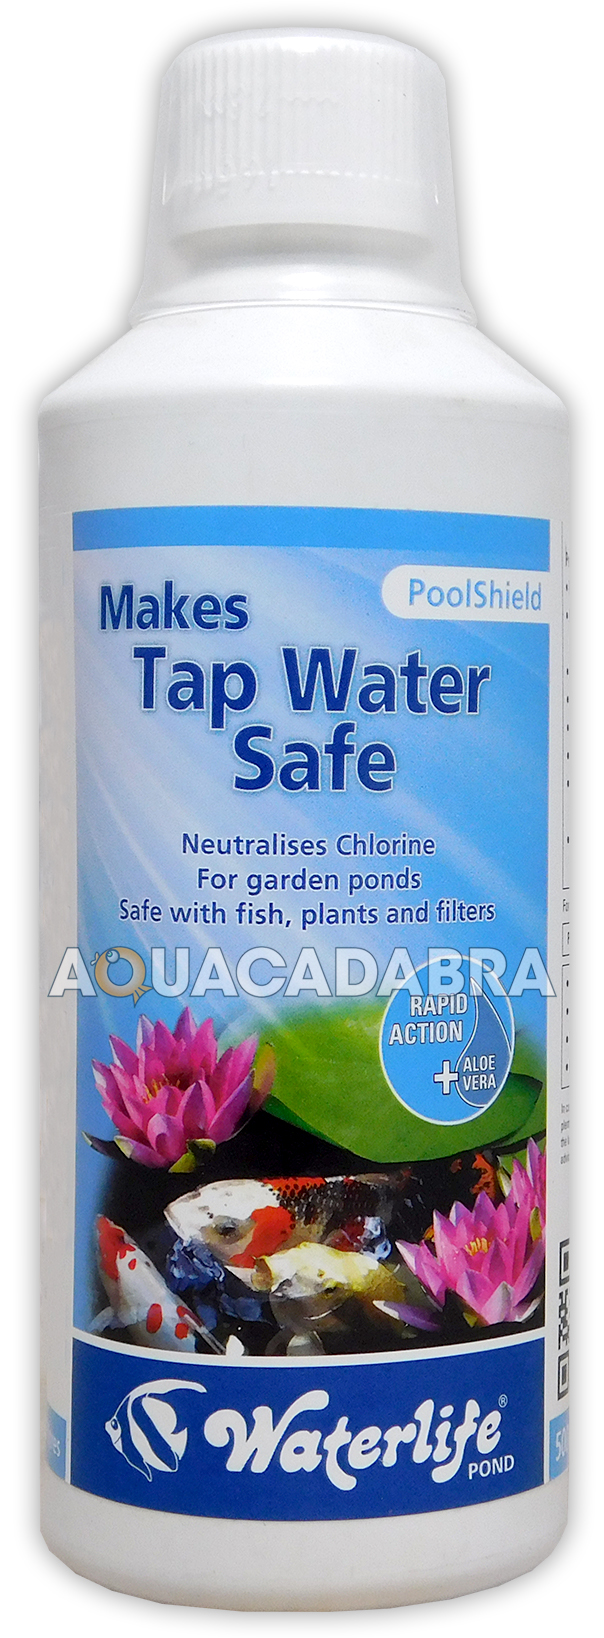 WATERLIFE-POOLSHIELD-250ml-500ml-1L-LITRE-TAP-WATER-SAFE-DECLORINATOR-FISH-POND